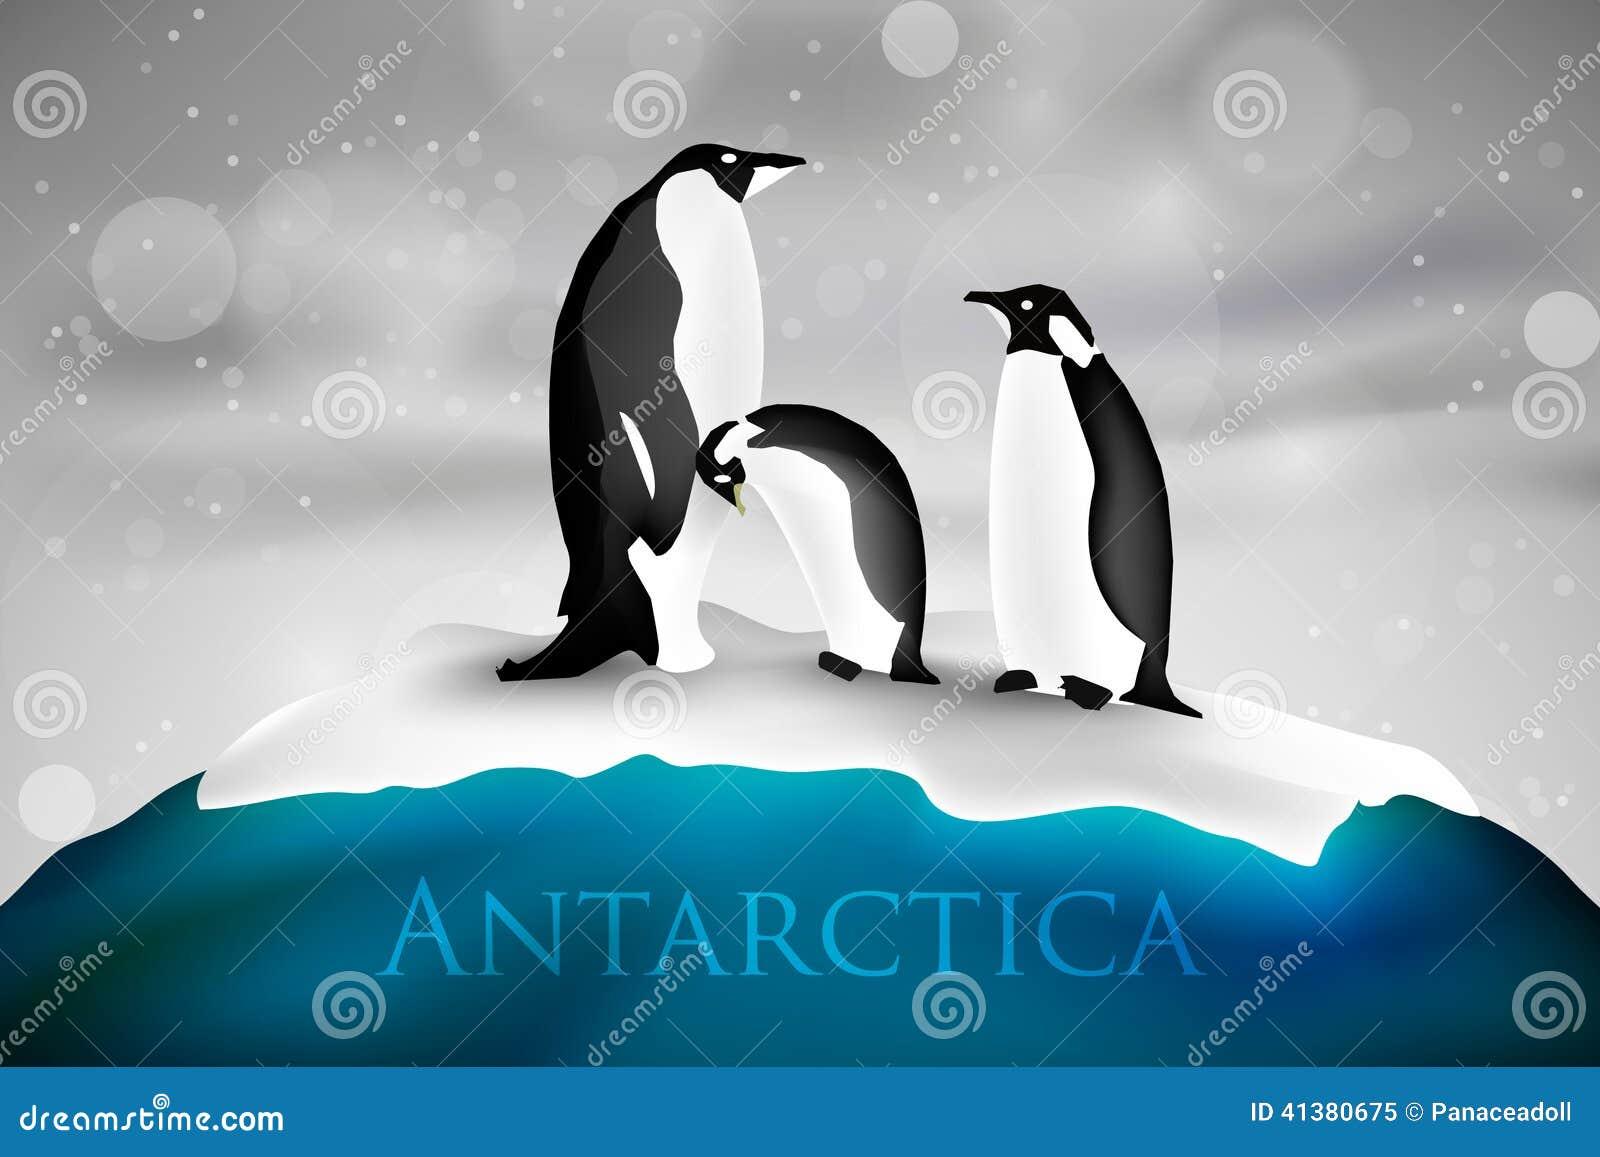 Antarctica with penguins